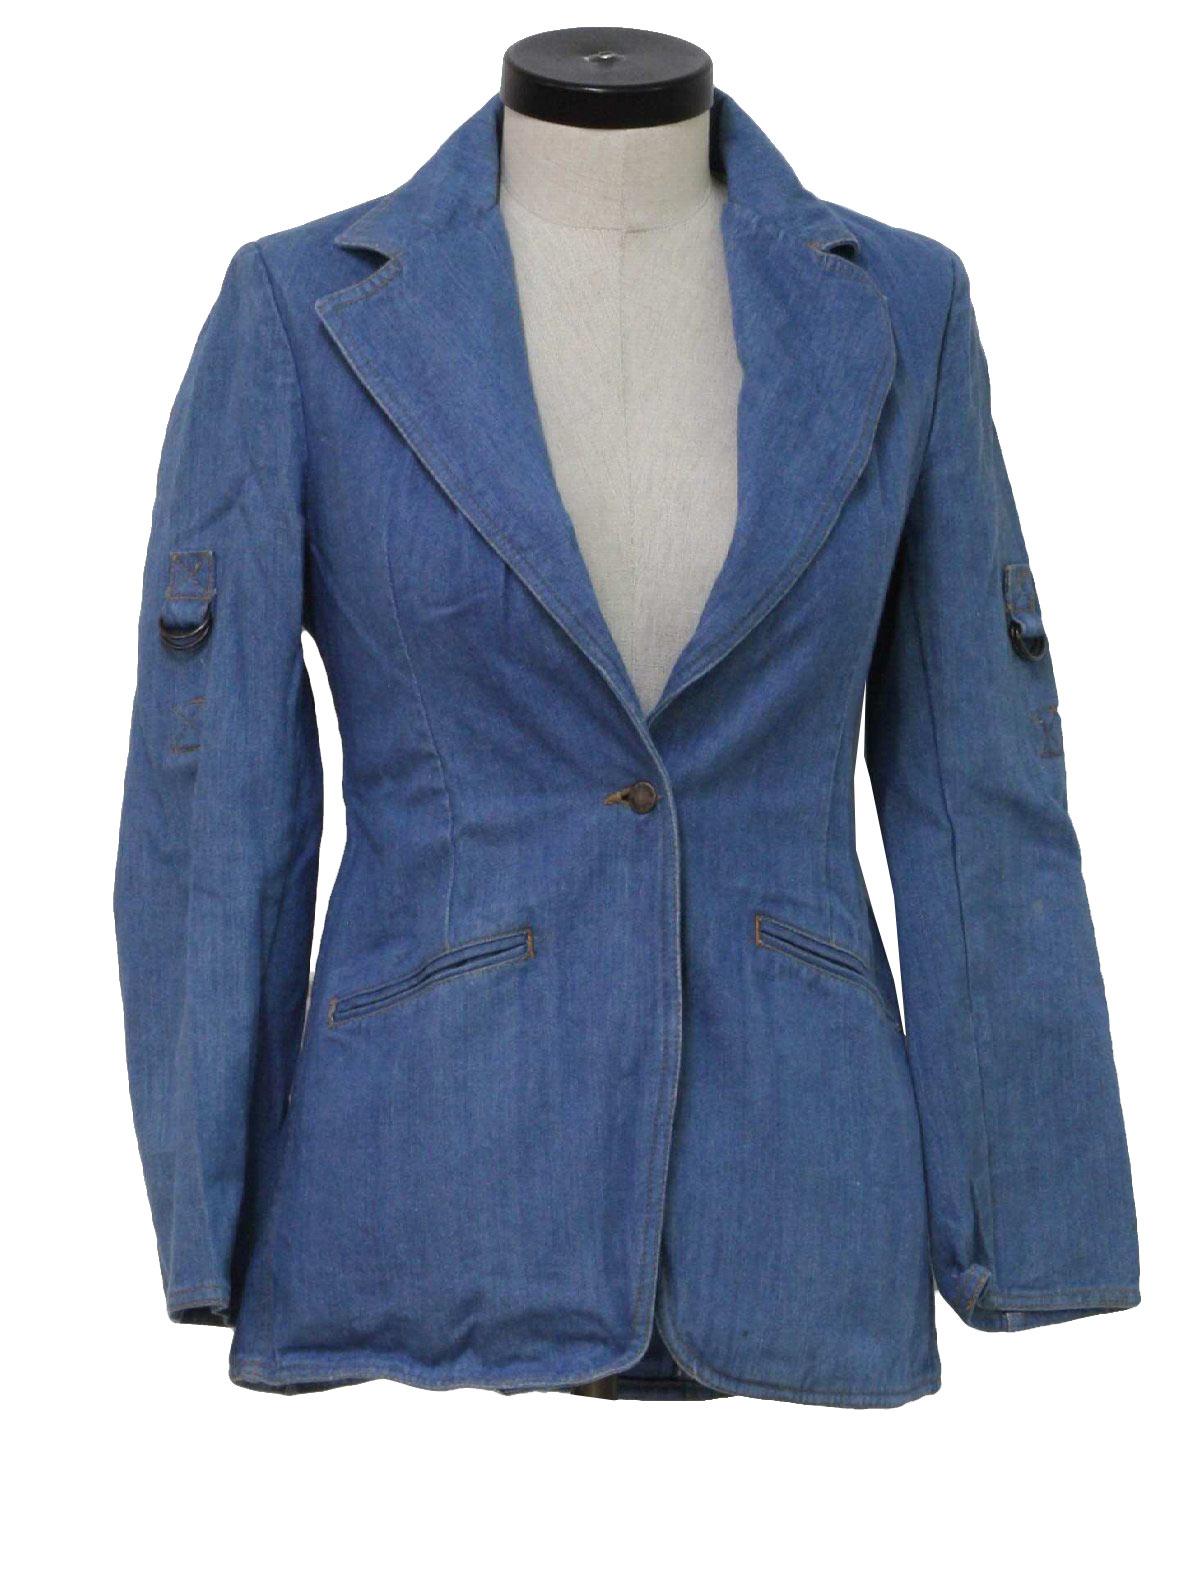 good reputation skilful manufacture authentic 1980's L Avion Womens Denim Blazer Style Jacket